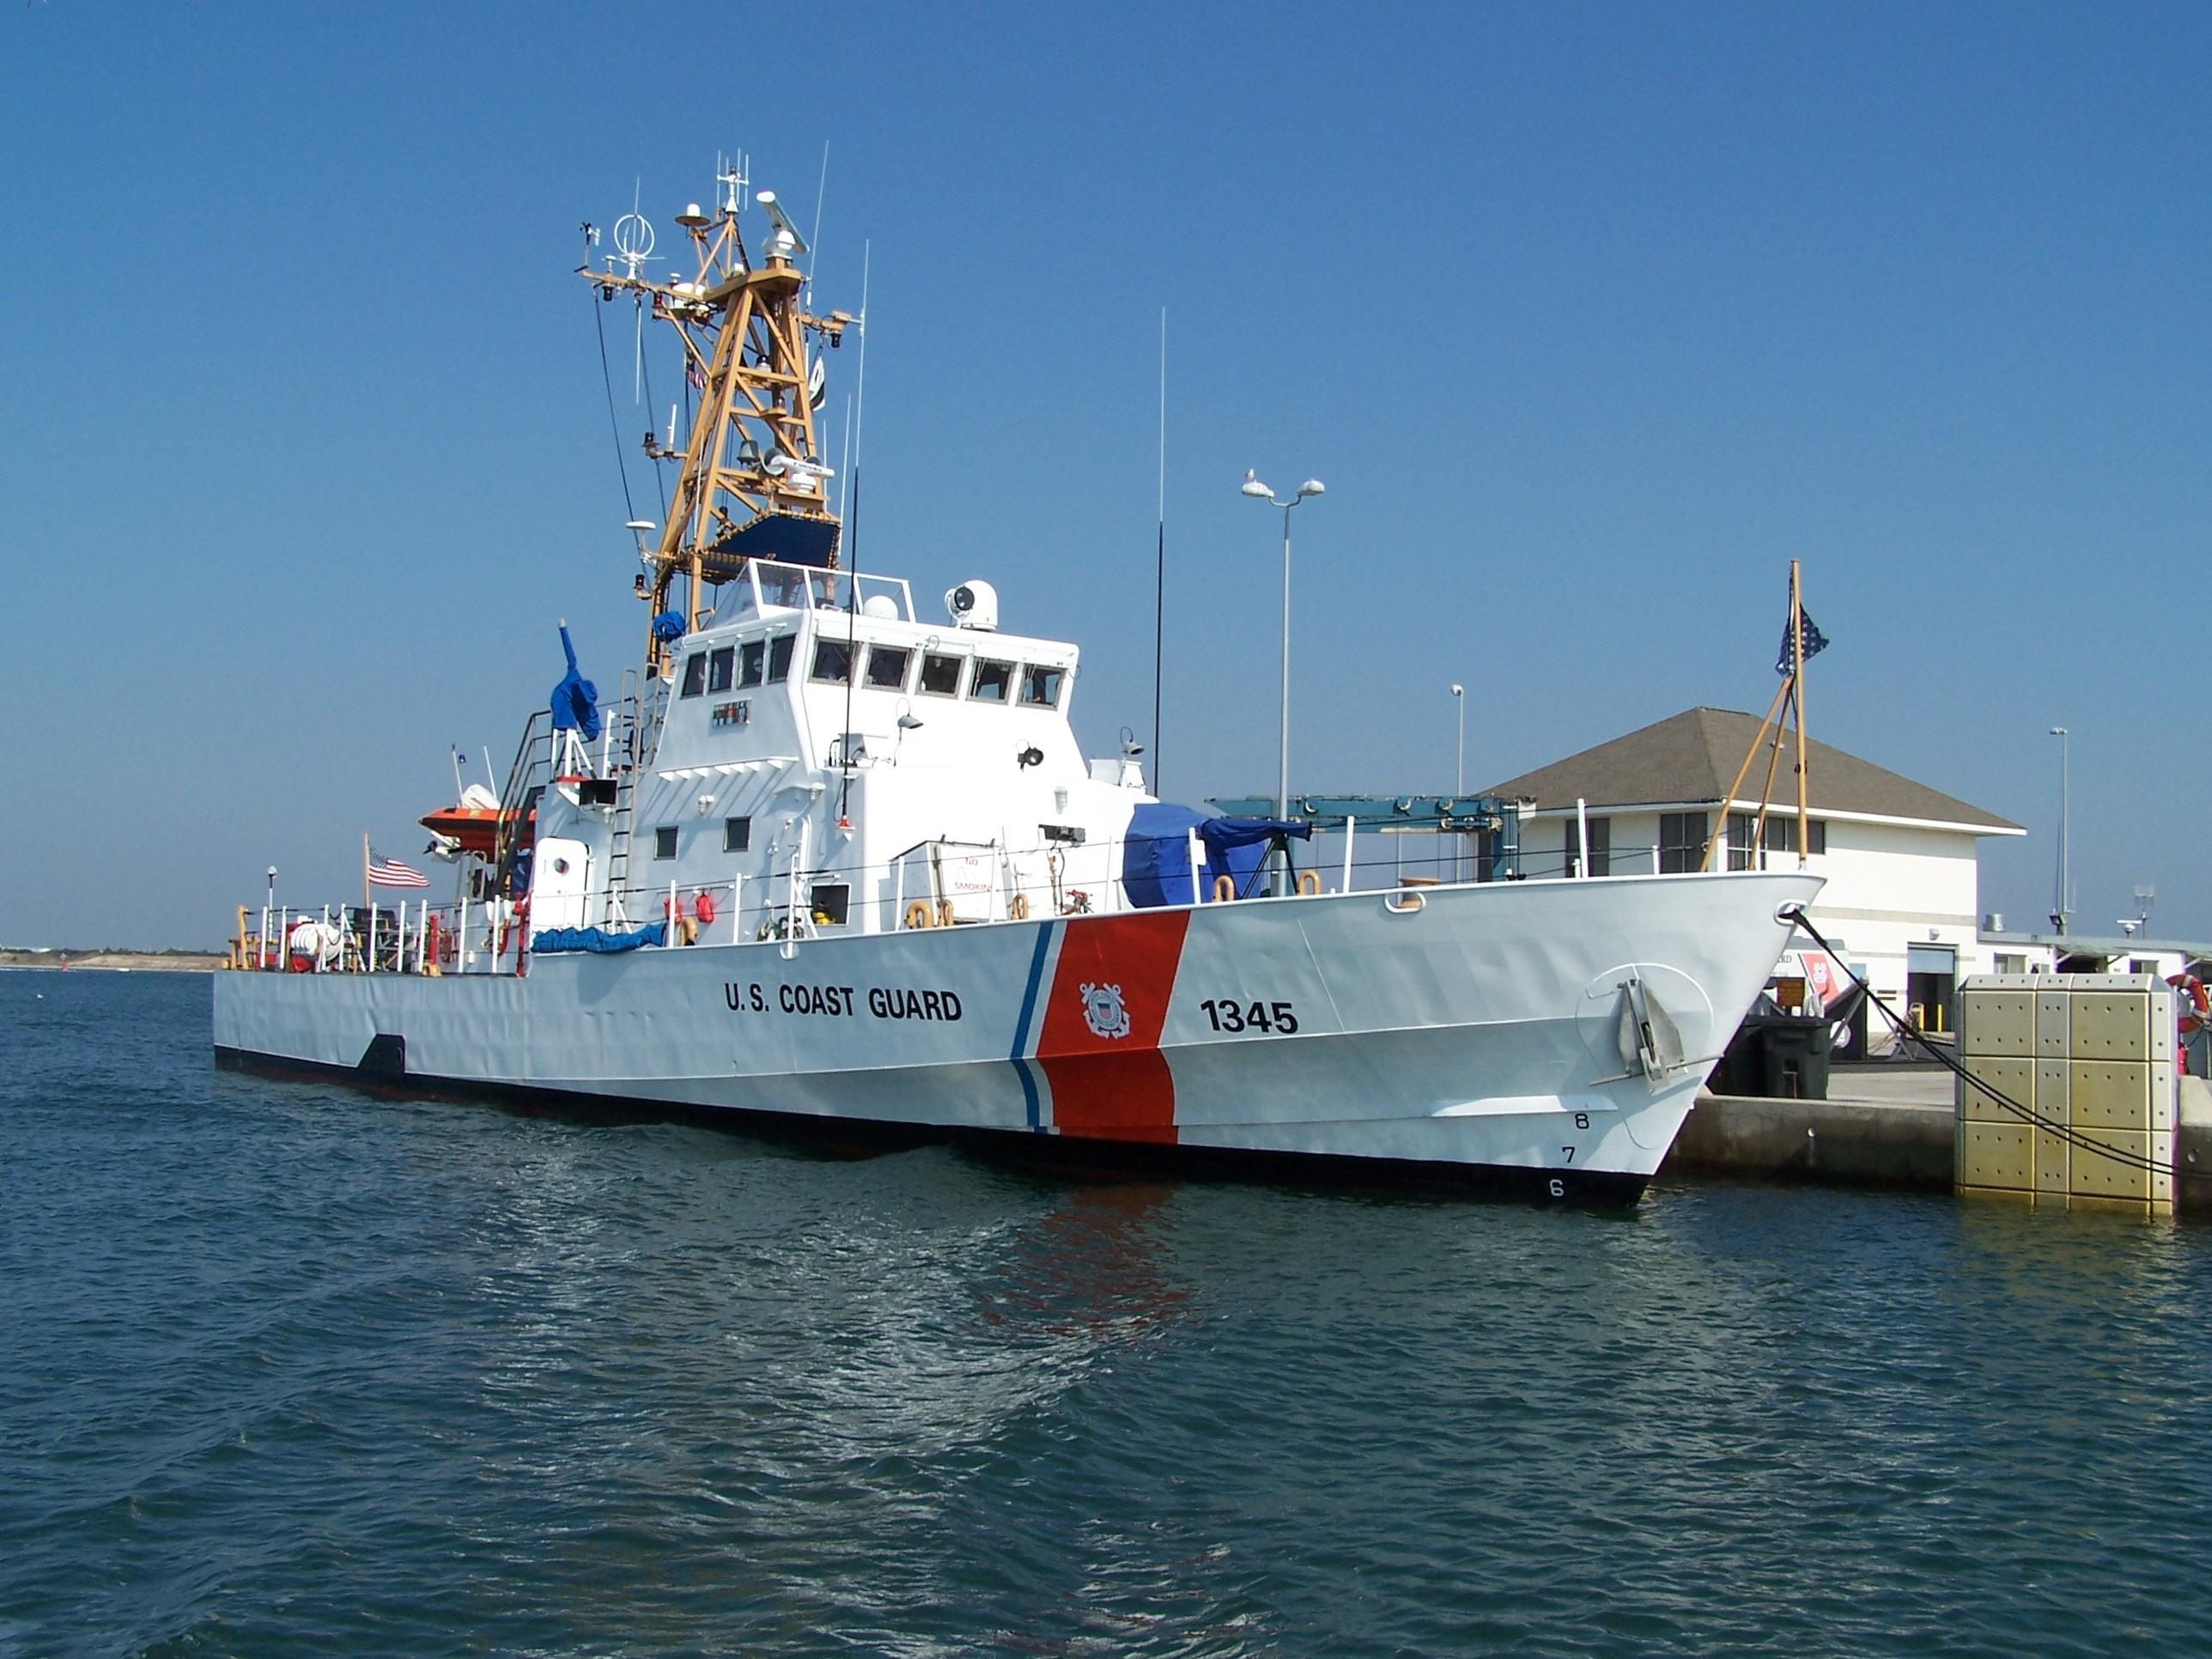 USCGC Staten Island WPB 1345